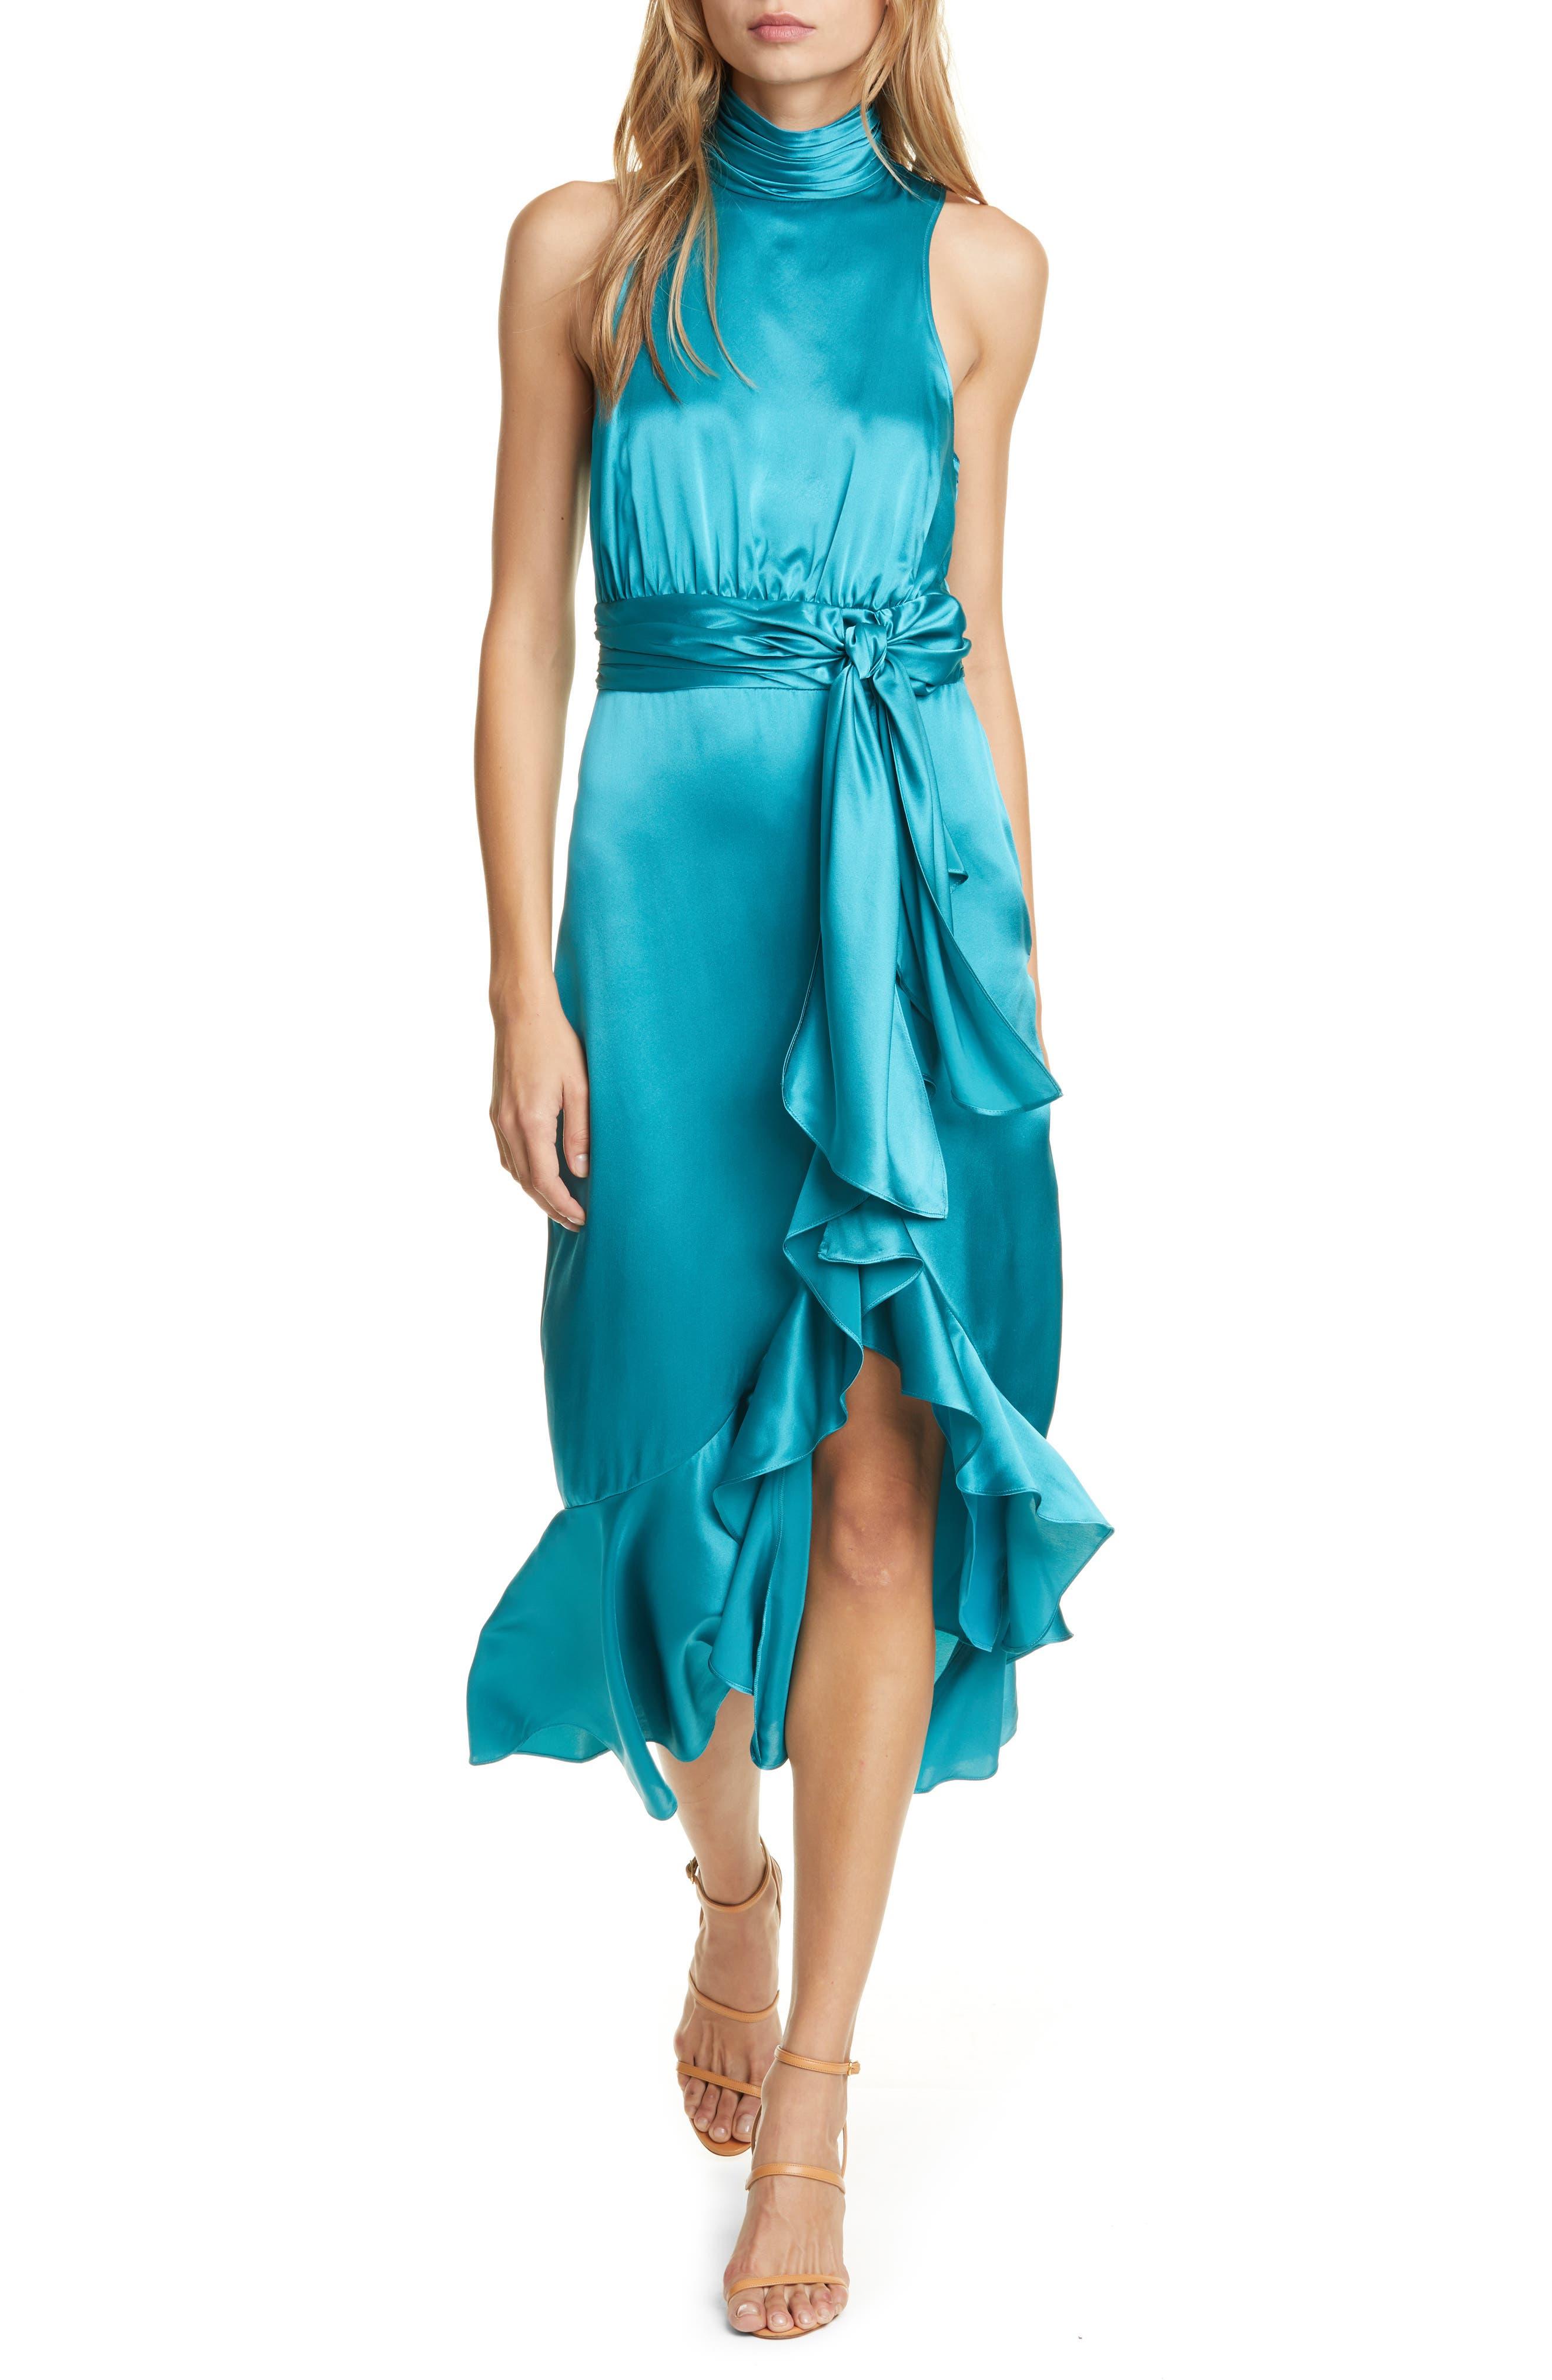 1960s – 70s Cocktail, Party, Prom, Evening Dresses Womens Cinq A Sept Silk Dress Size 0 - Blue $645.00 AT vintagedancer.com